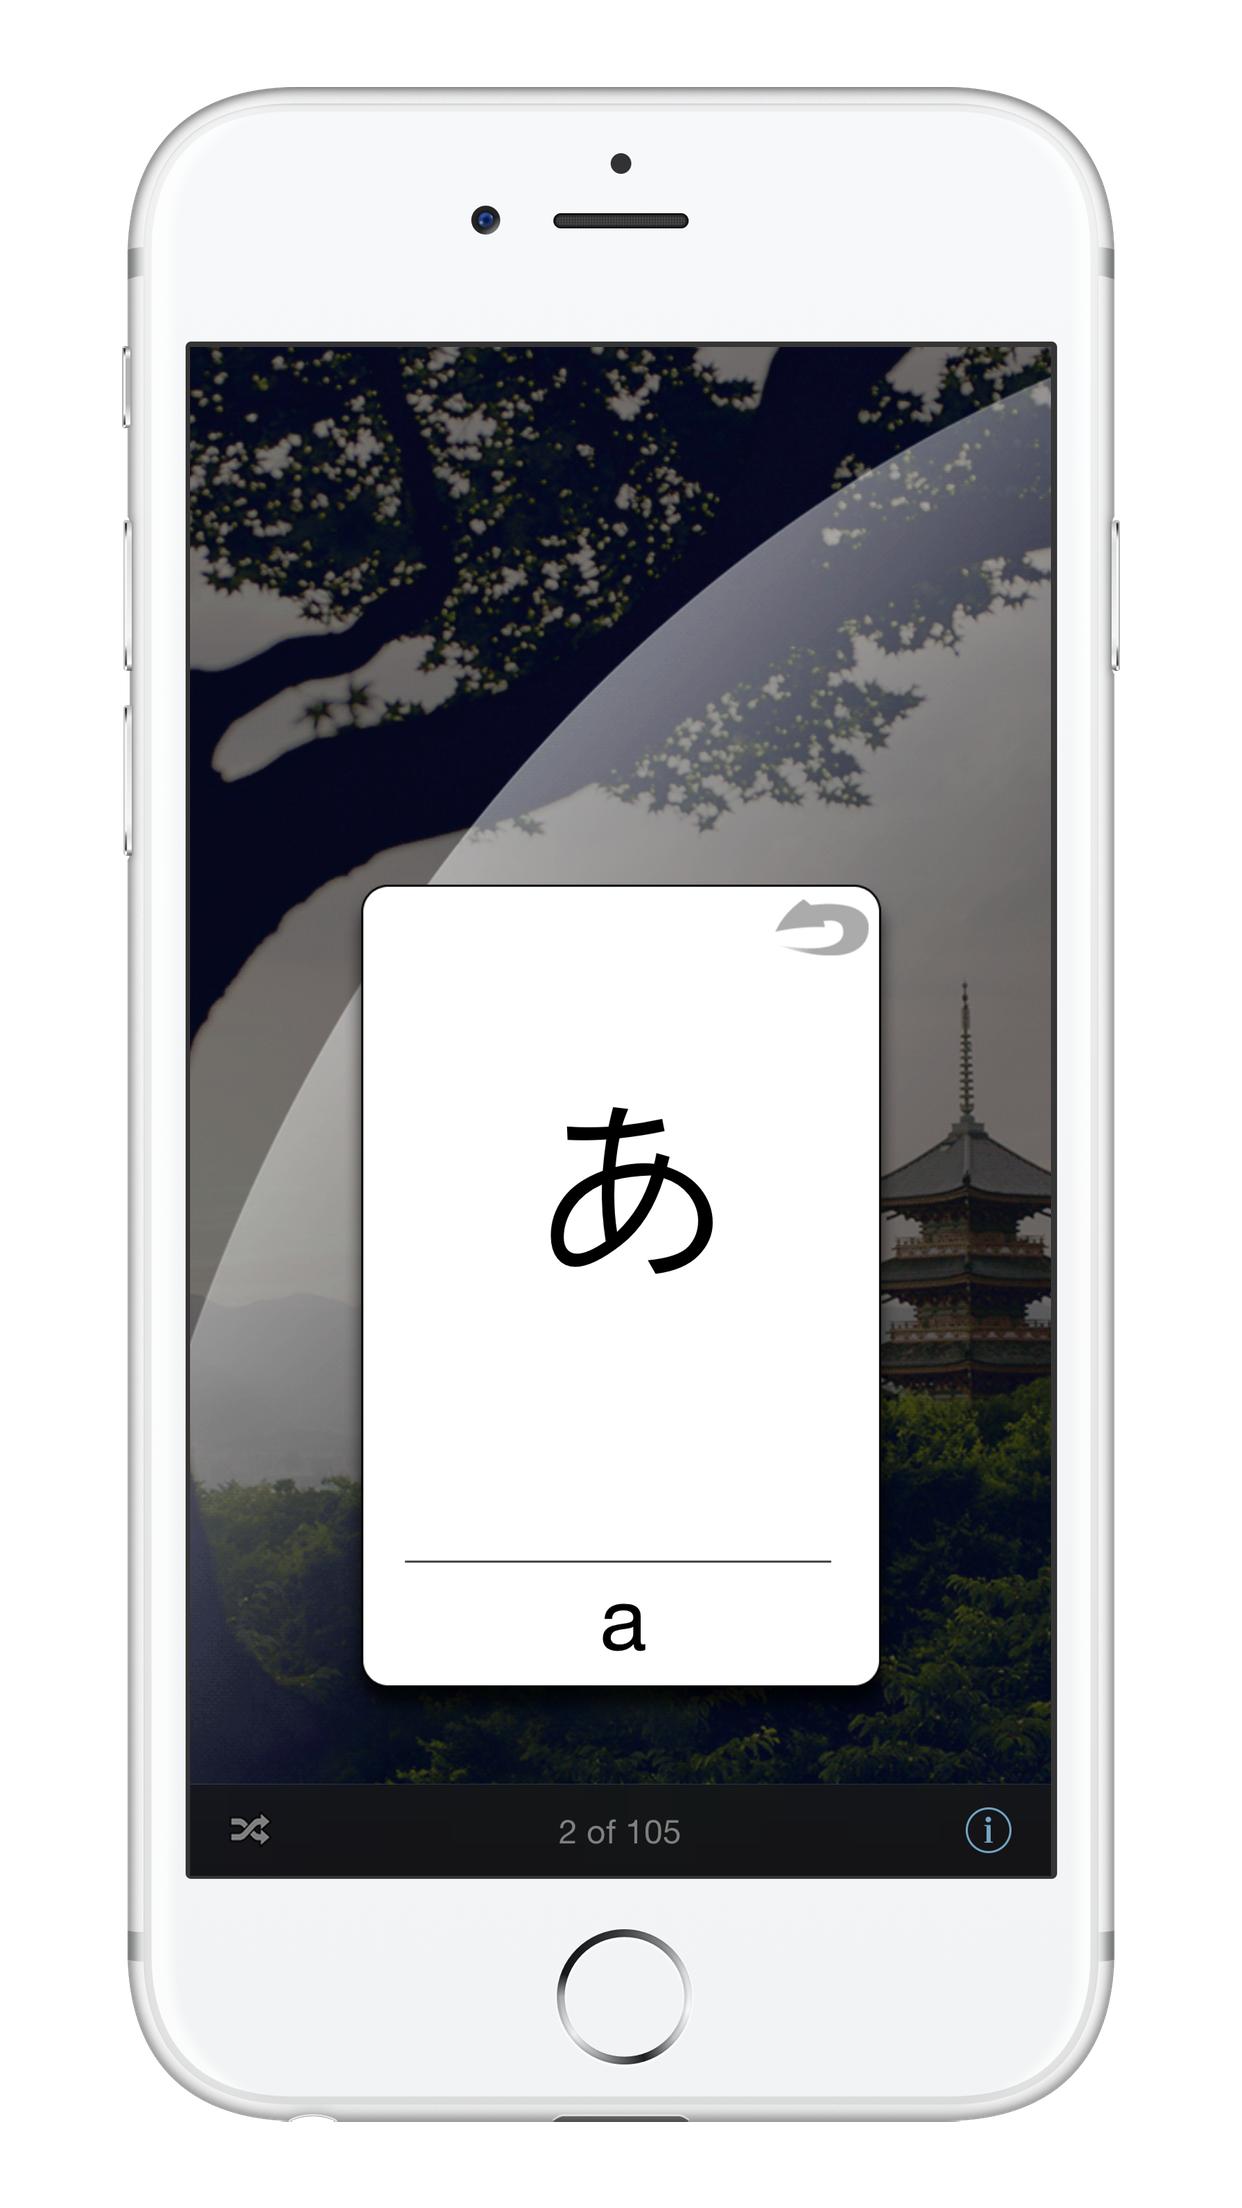 Hiragana screenshot 2.png